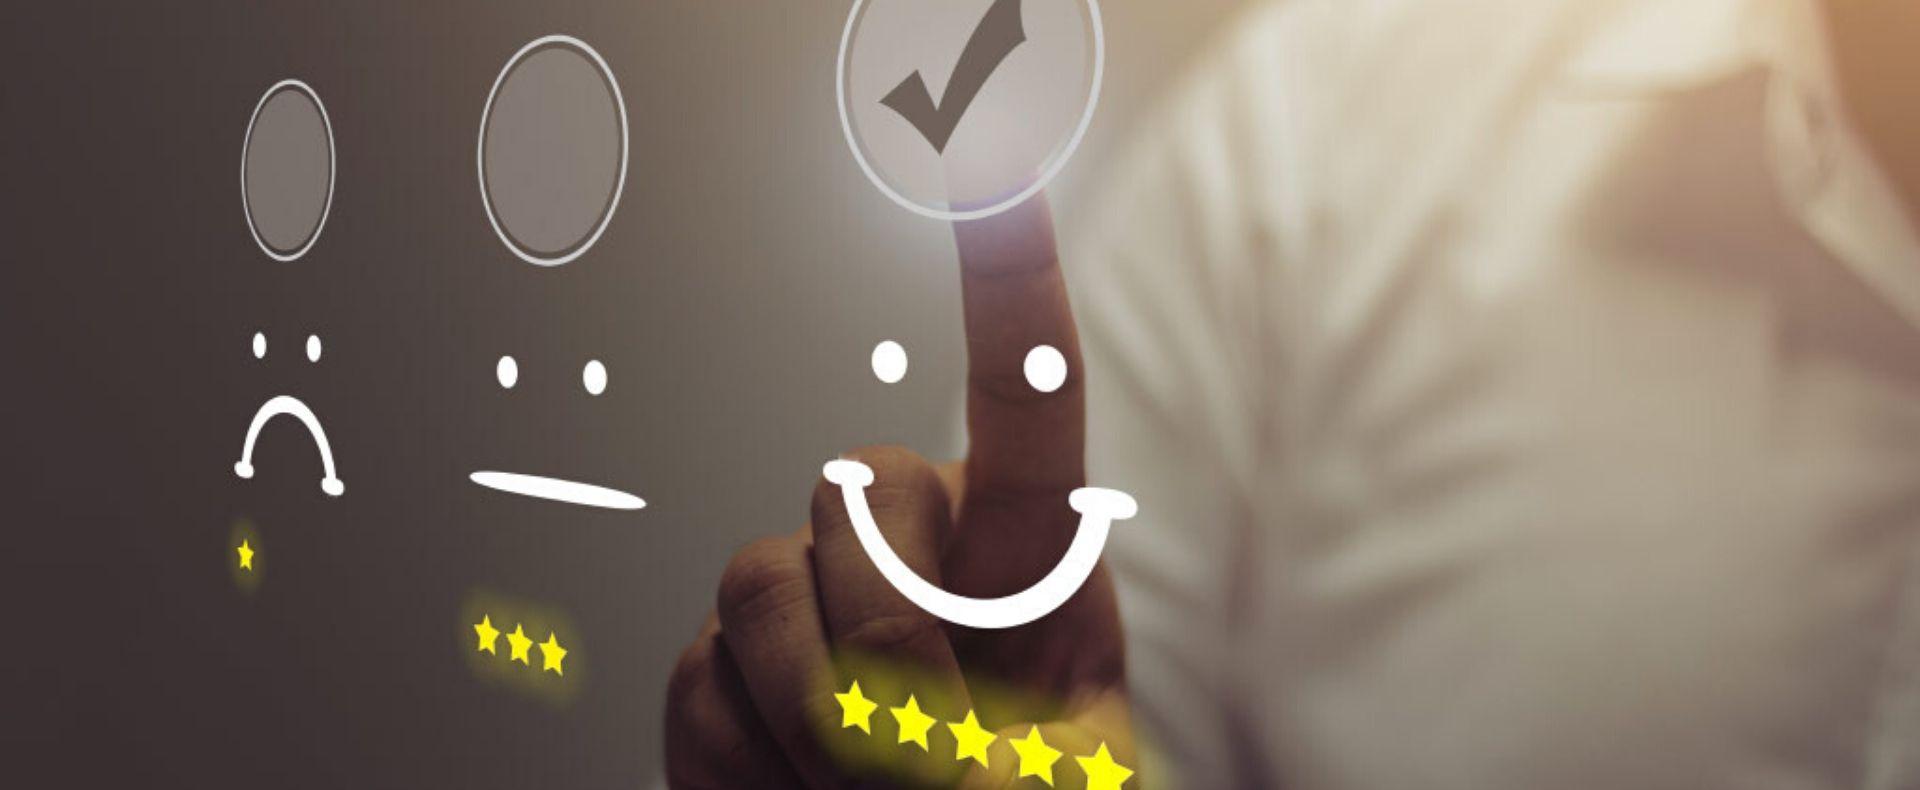 Webinar gratuito 26.03.2020 | SAP Business One Customer Experience & Digital Customer Journey